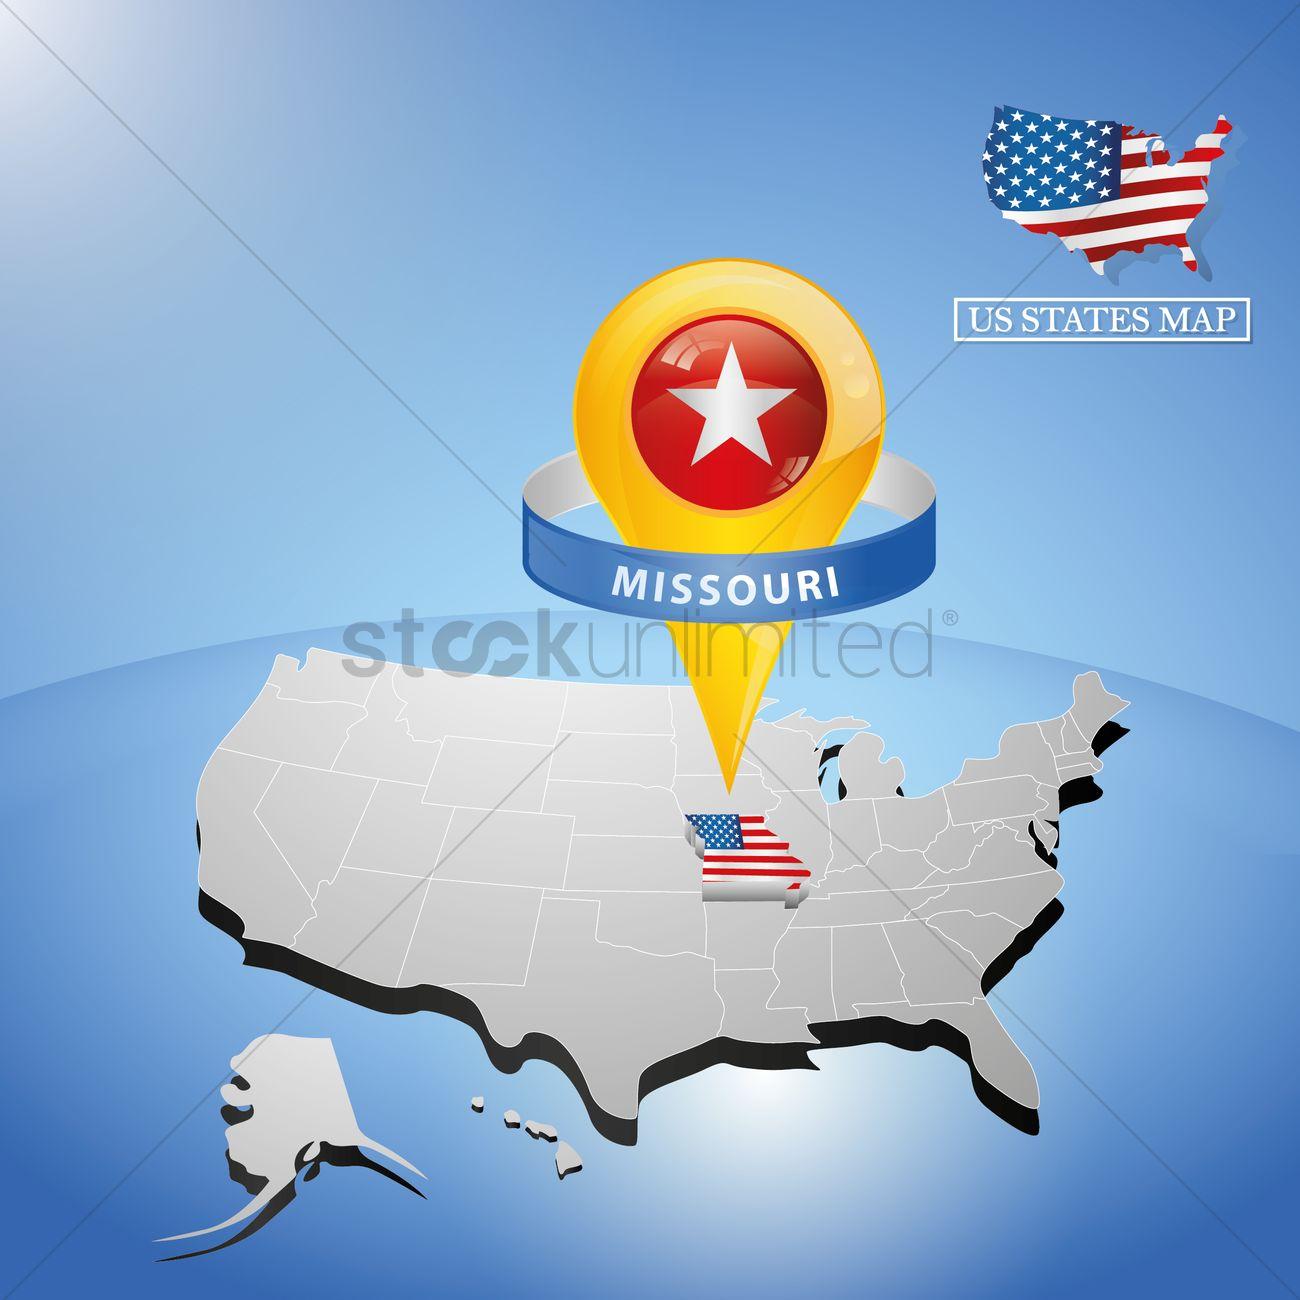 Missouri State On Map Of Usa Vector Image StockUnlimited - Missouri usa map